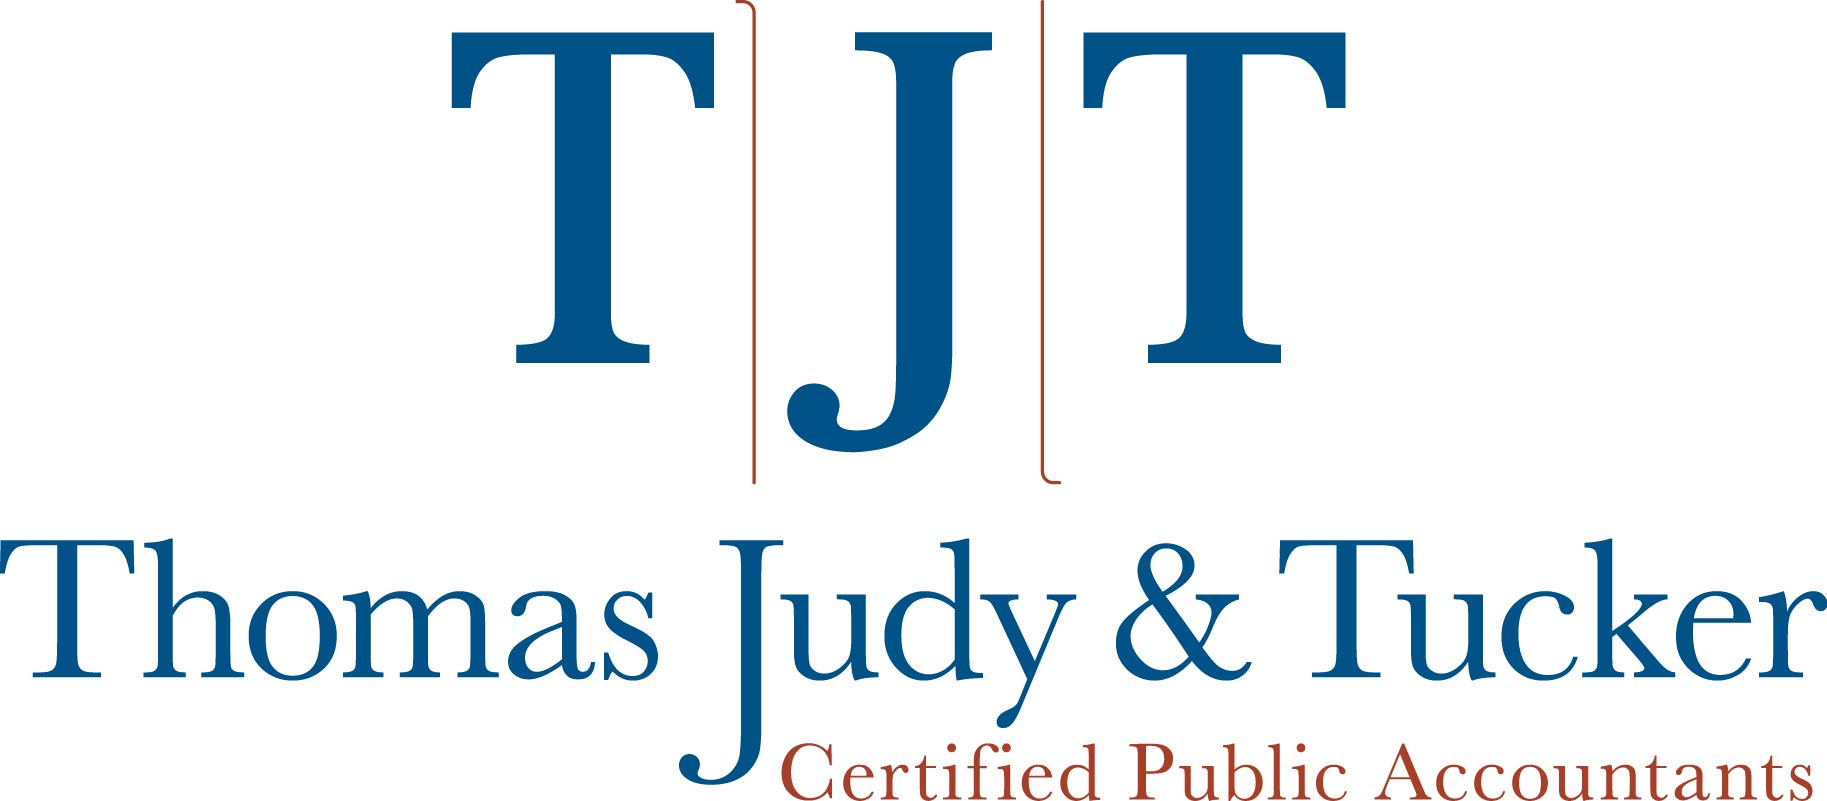 Sponsor Thomas, Judy & Tucker P.A.